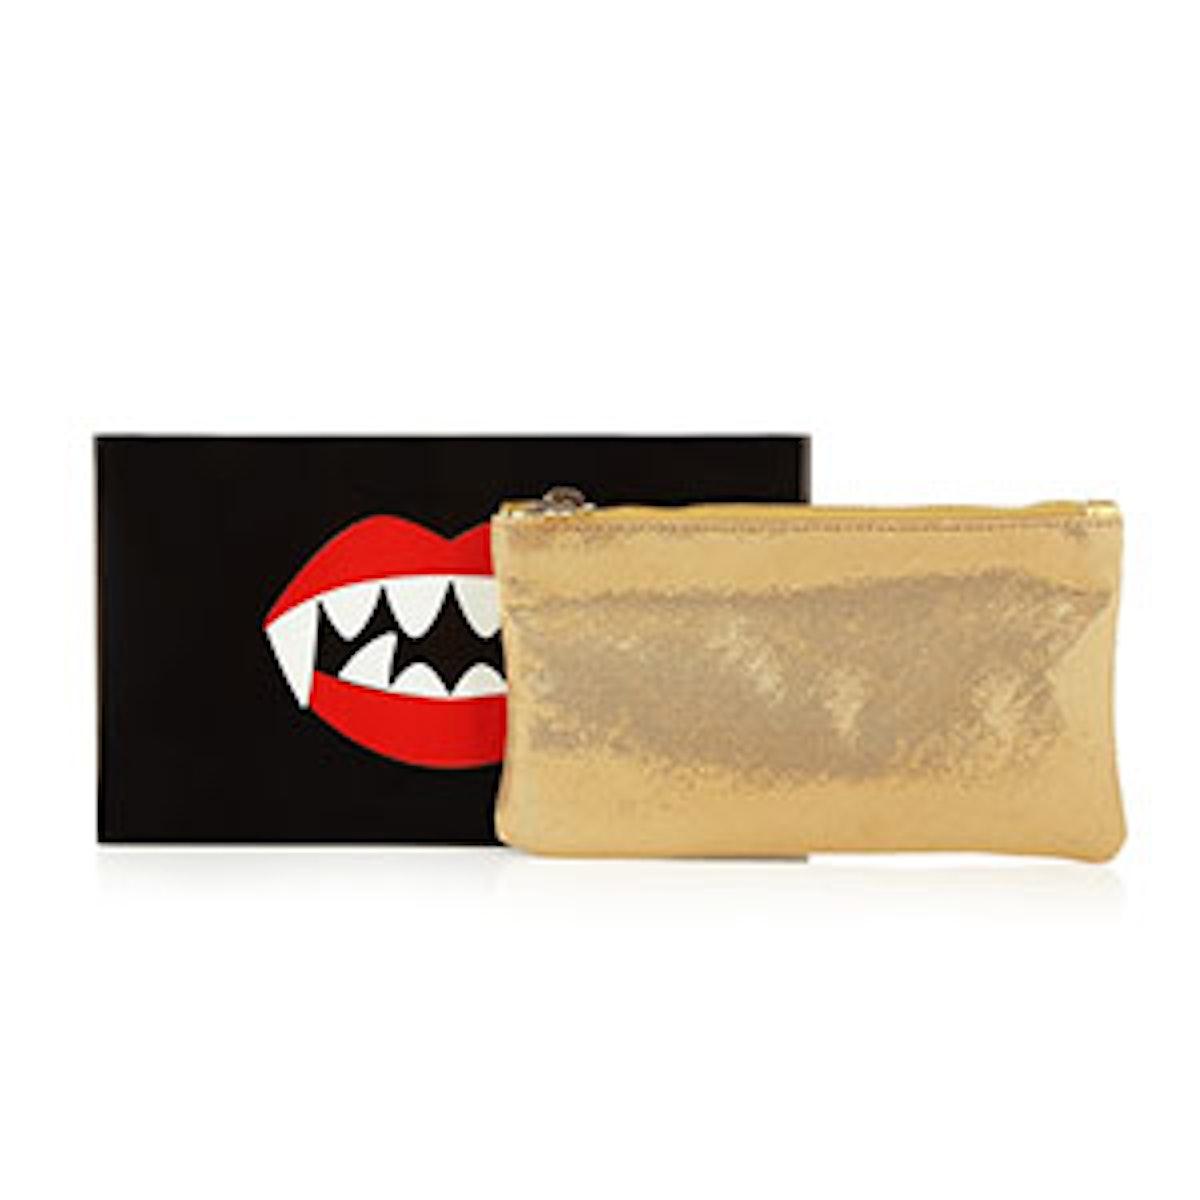 Sucker for Pandora Perspex Box Clutch